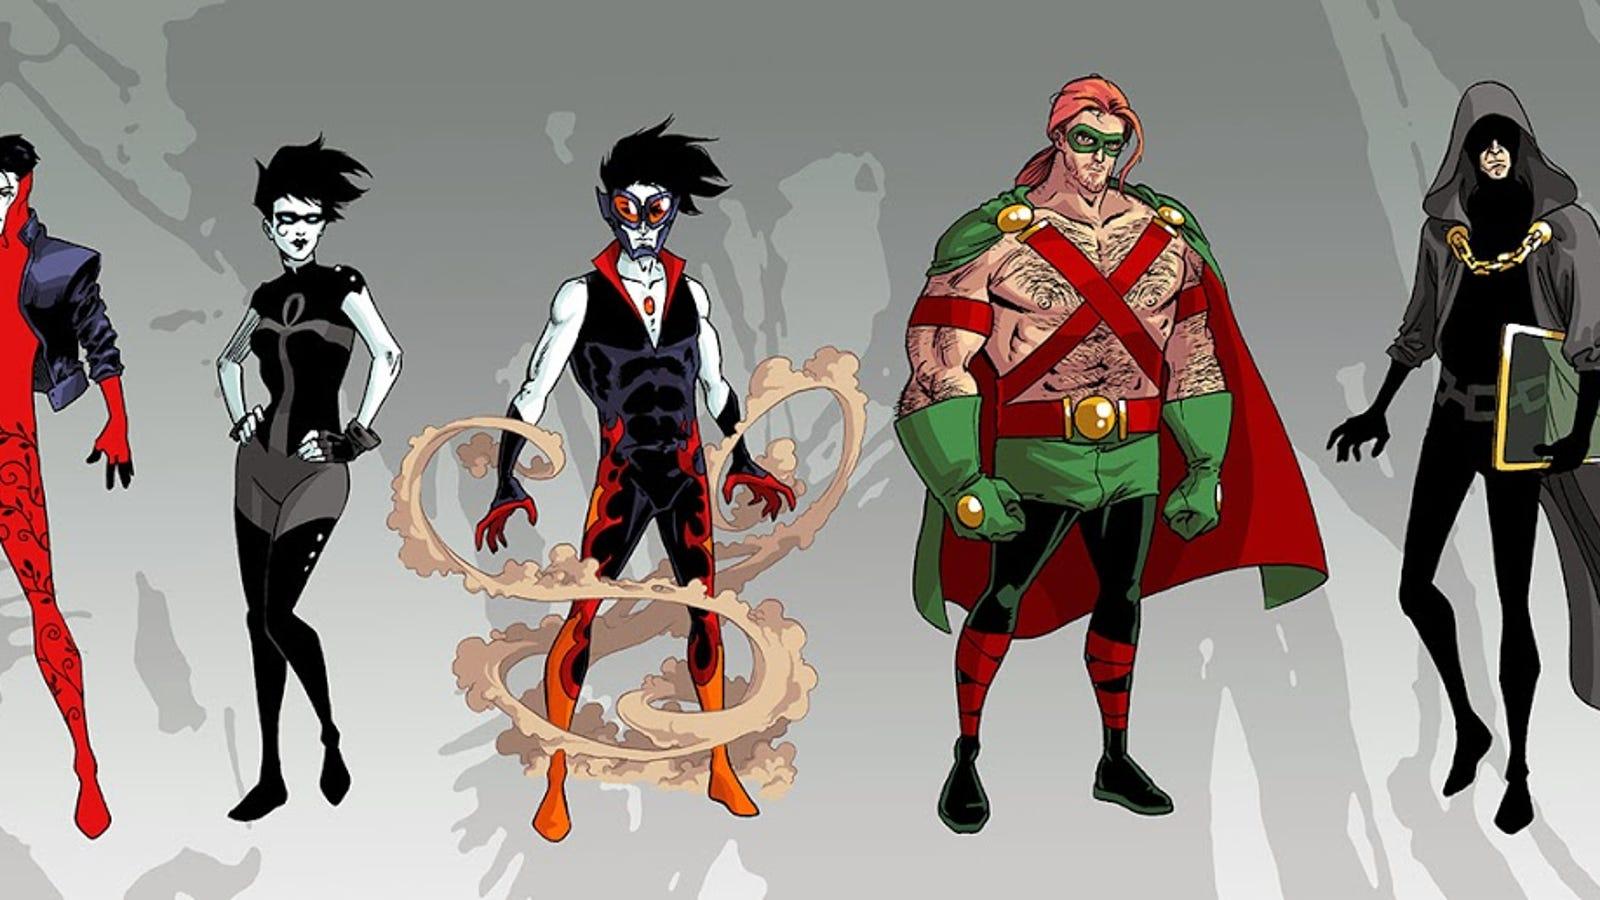 Sandmans Endless Reimagined As Superheroes